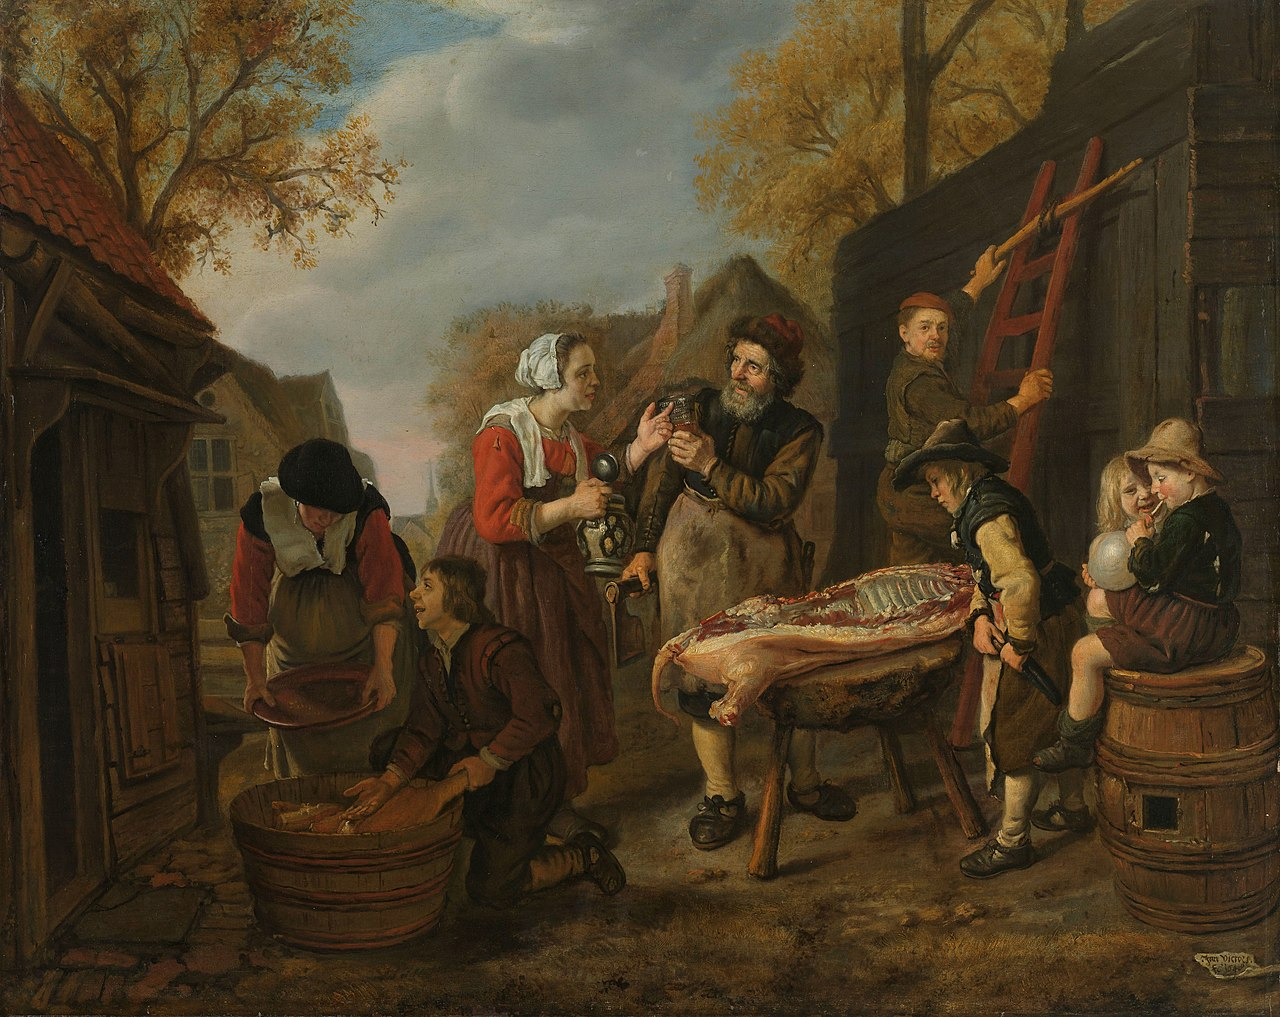 Jan Victors 1654 Le boucher (De varkensslachter) Rijksmuseum